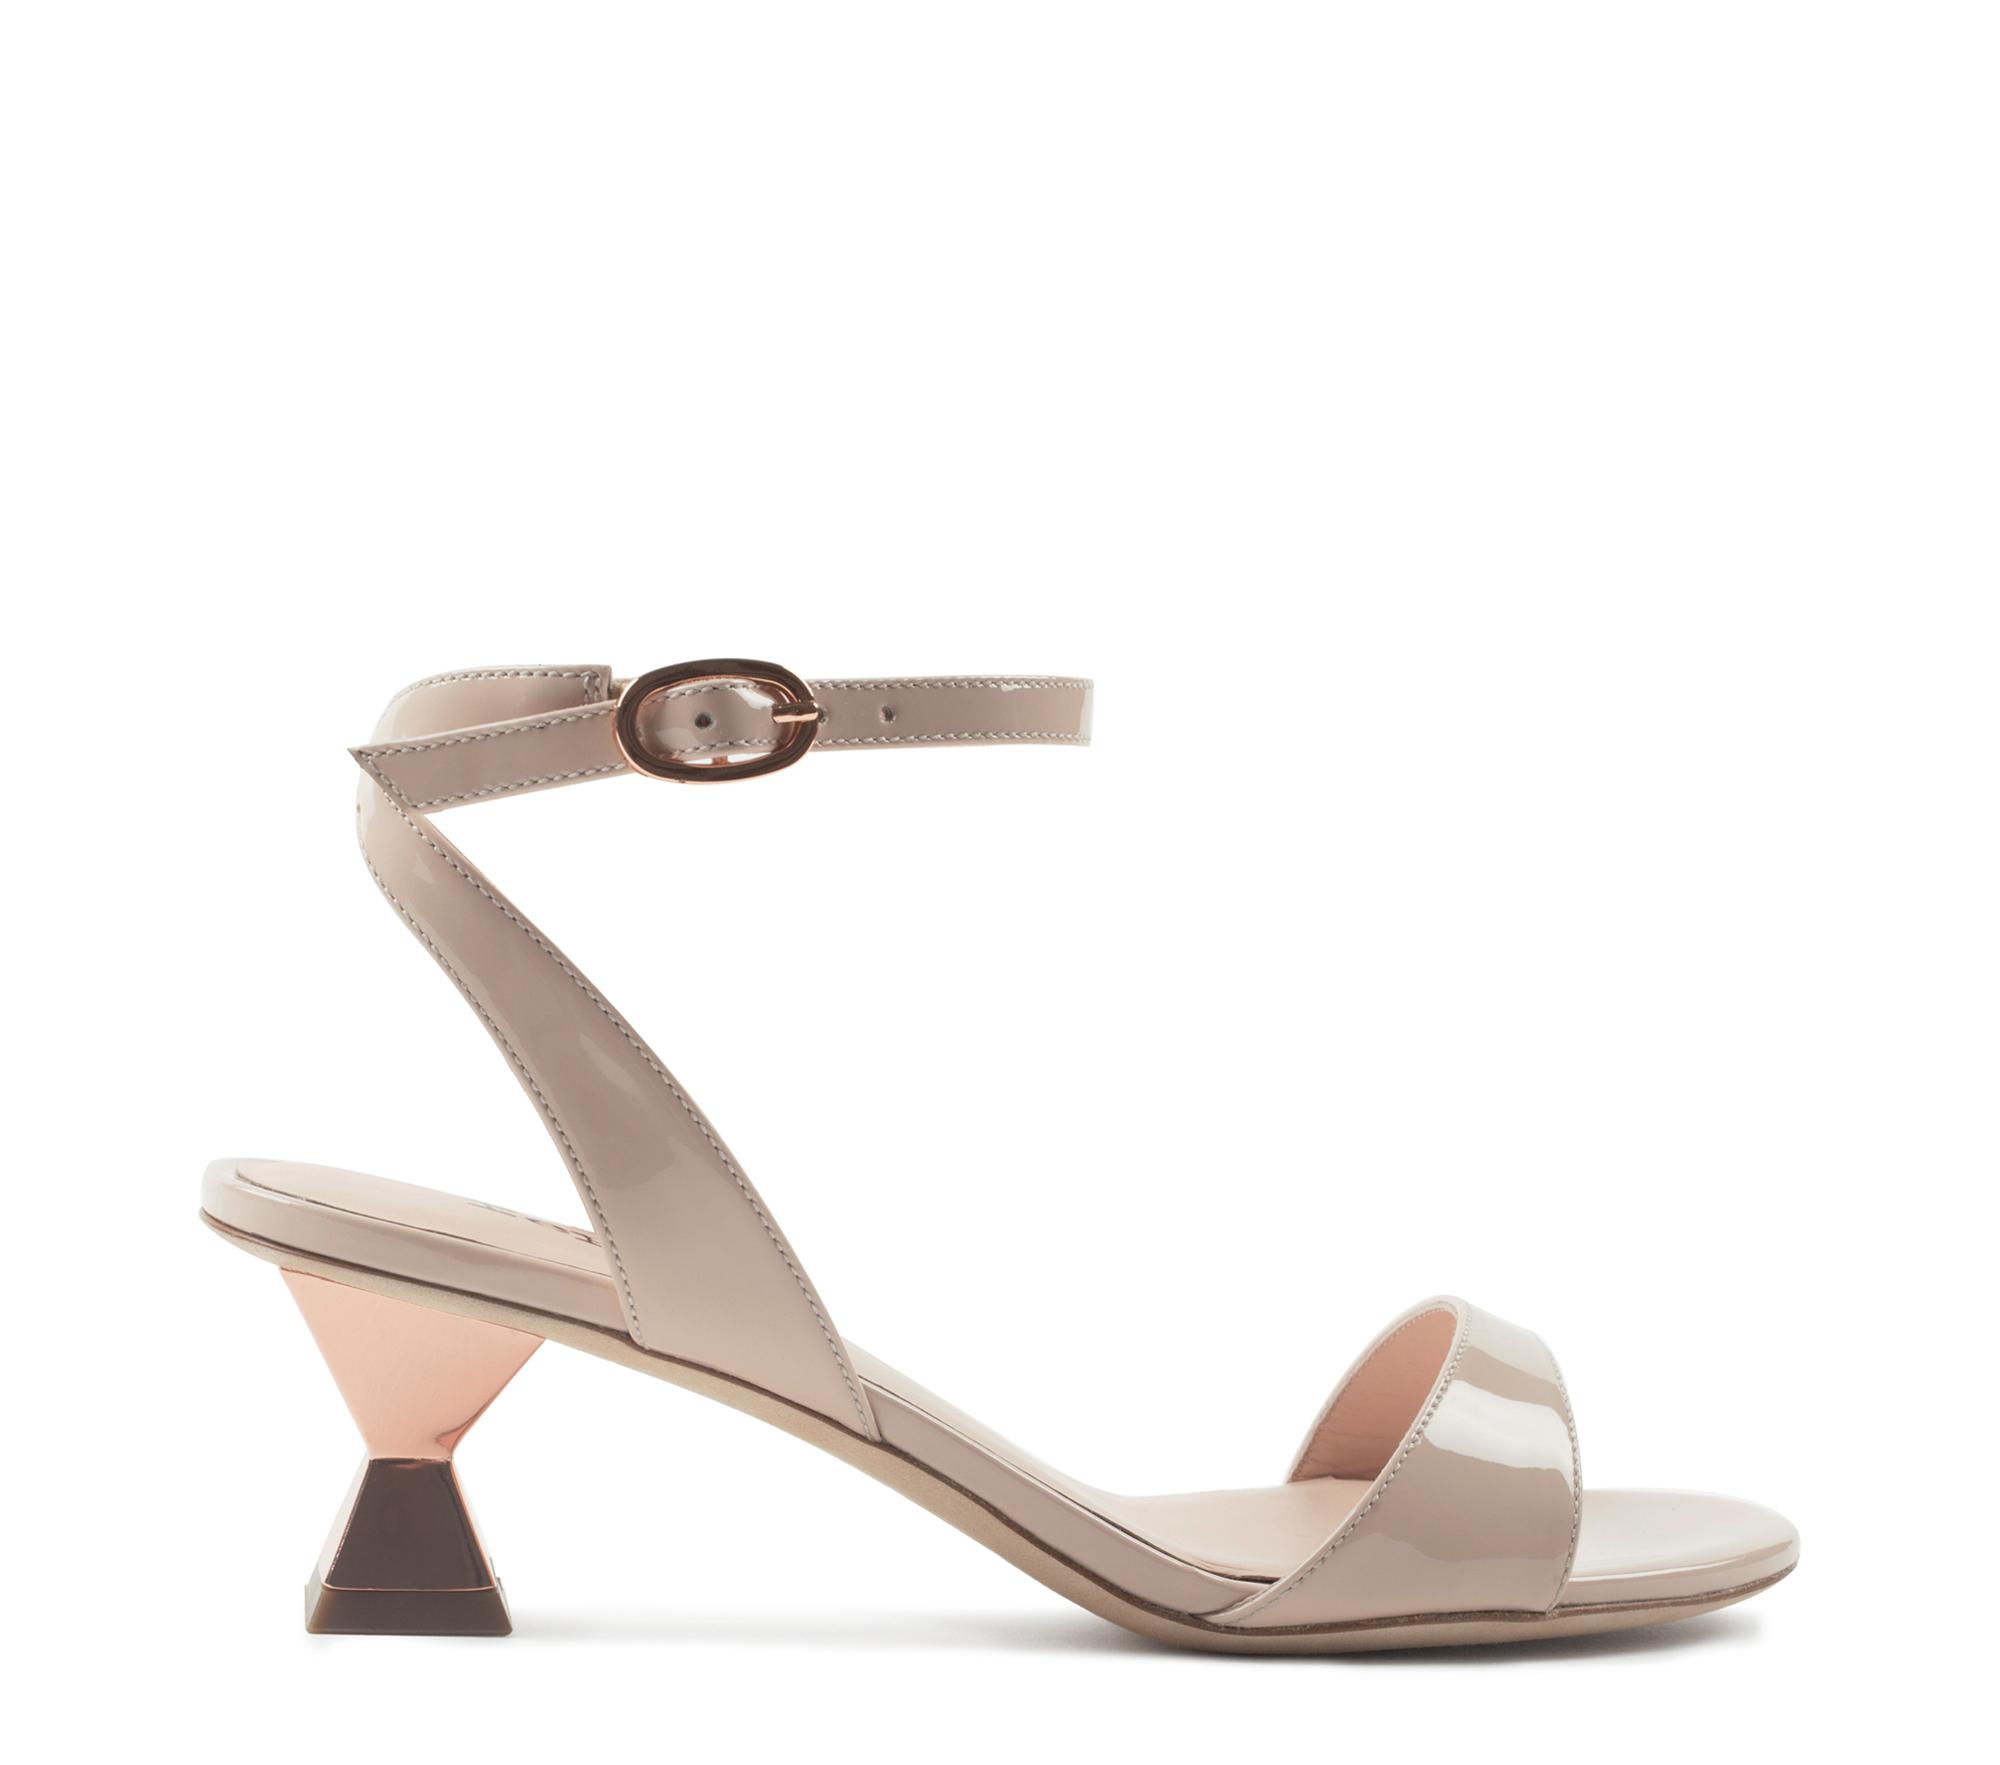 Ivana sandal